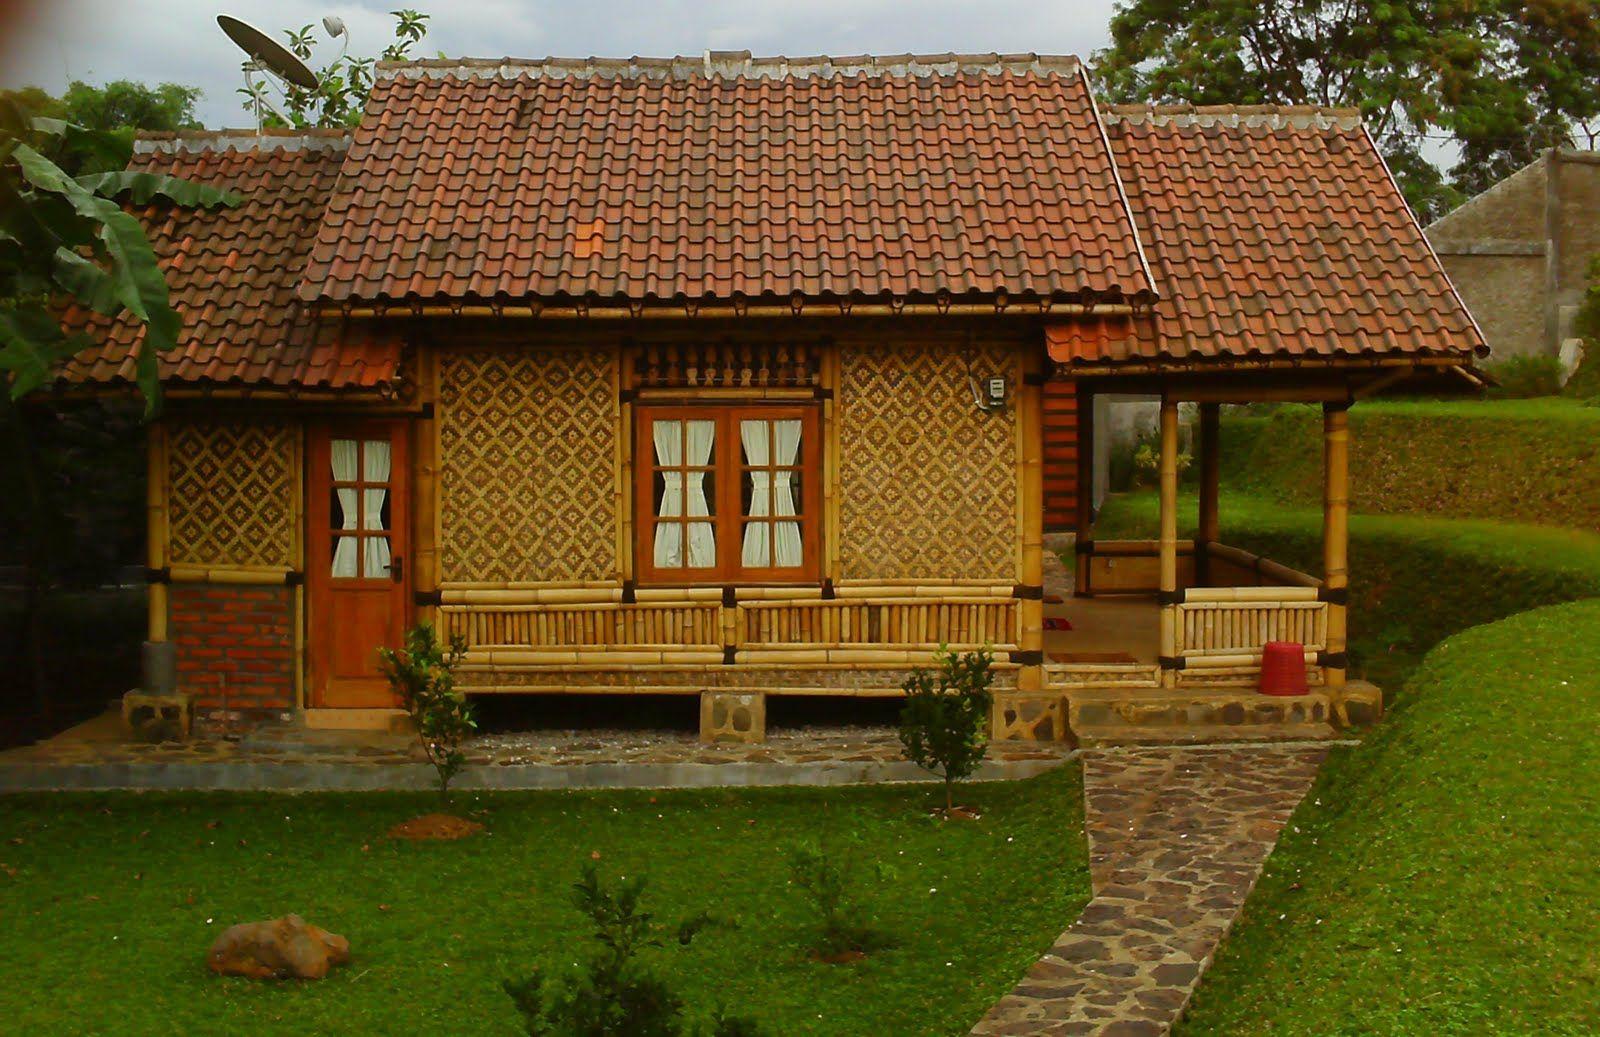 Contoh Desain Rumah Bambu Minimalis Modern Terbaru Rumah Bambu